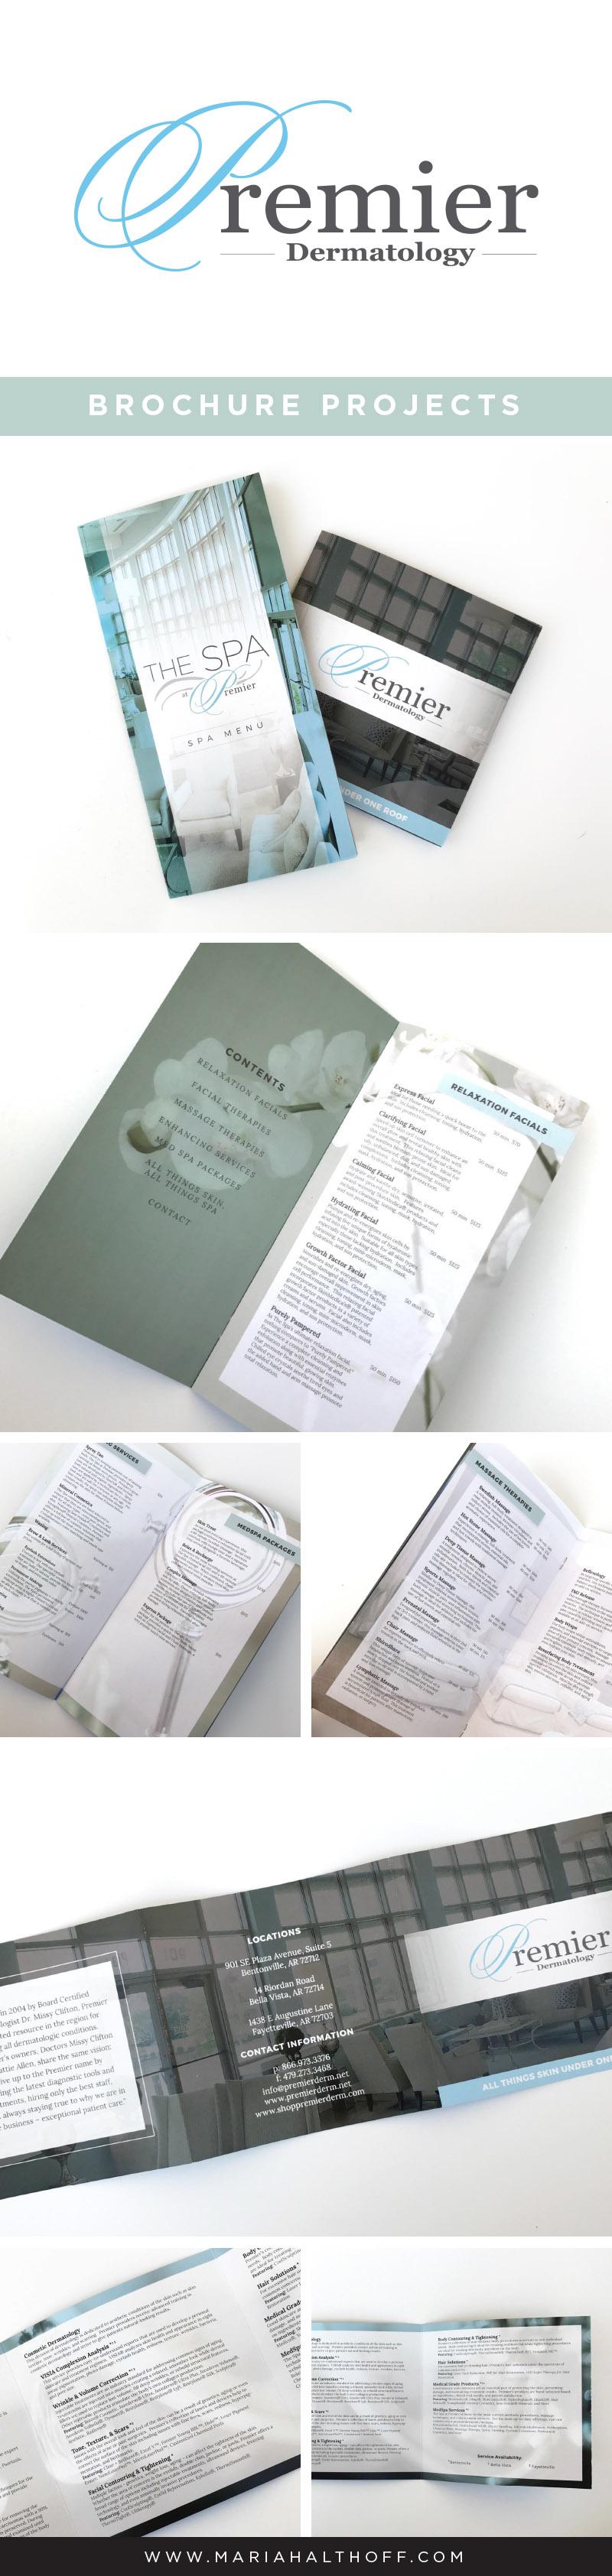 Brochure graphic design, design layout, multi-page brochure, square trifold brochure design for Premier Dermatology – designed by Mariah Althoff.